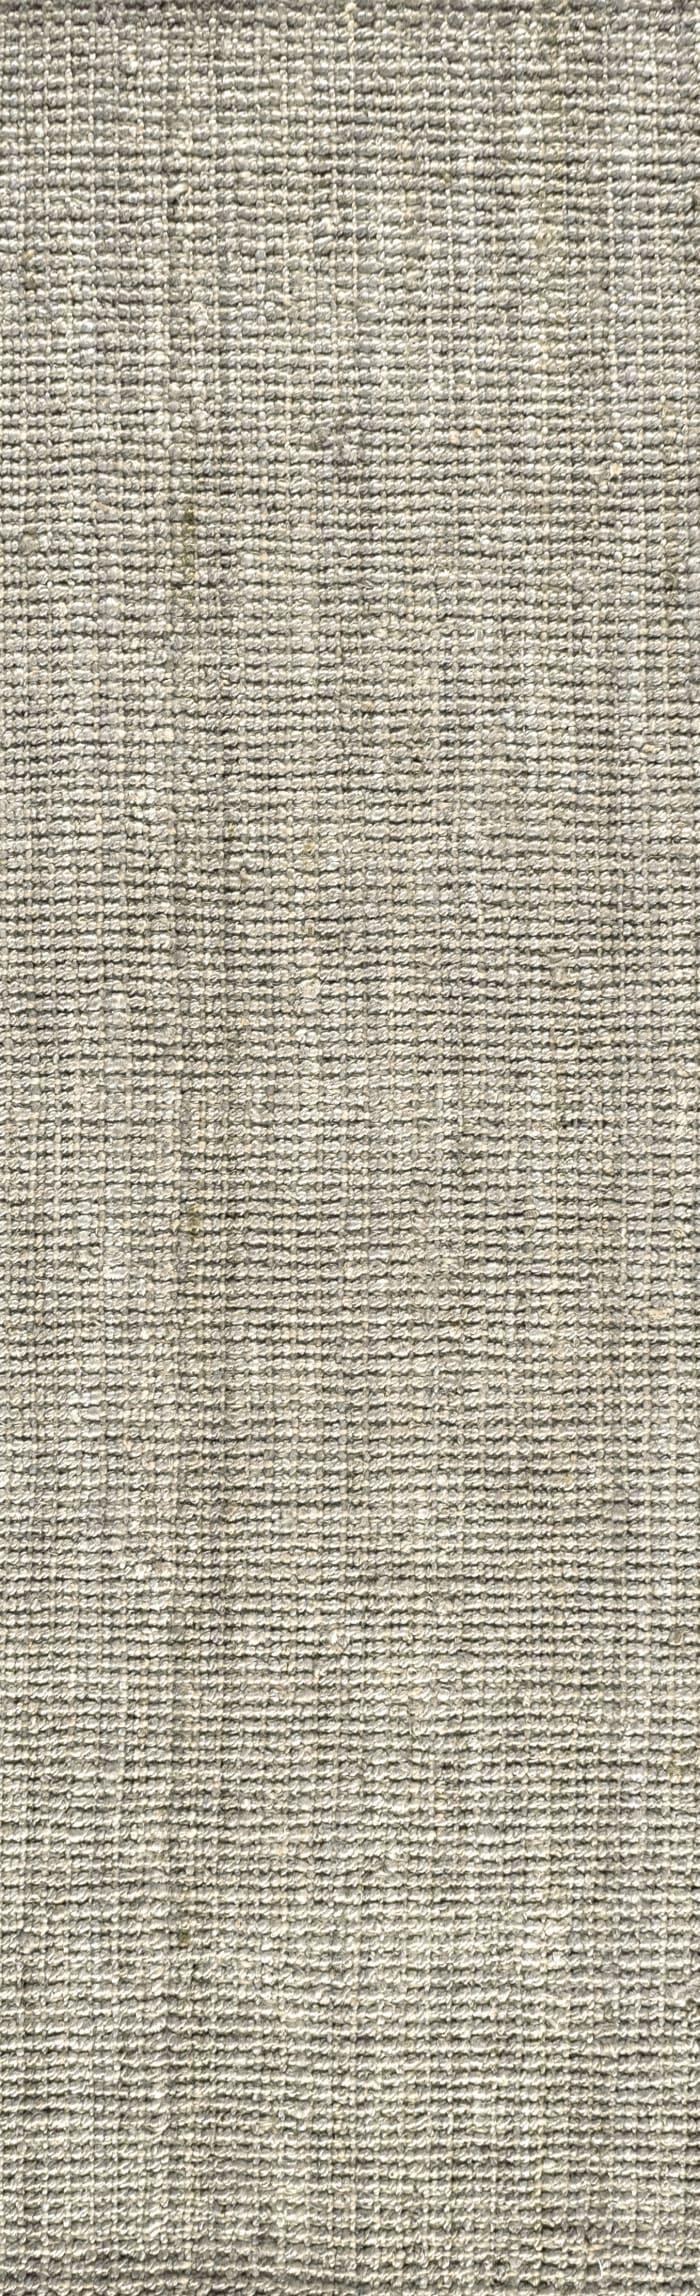 Hand Woven Chunky Jute Gray 2' x 8' Runner Rug